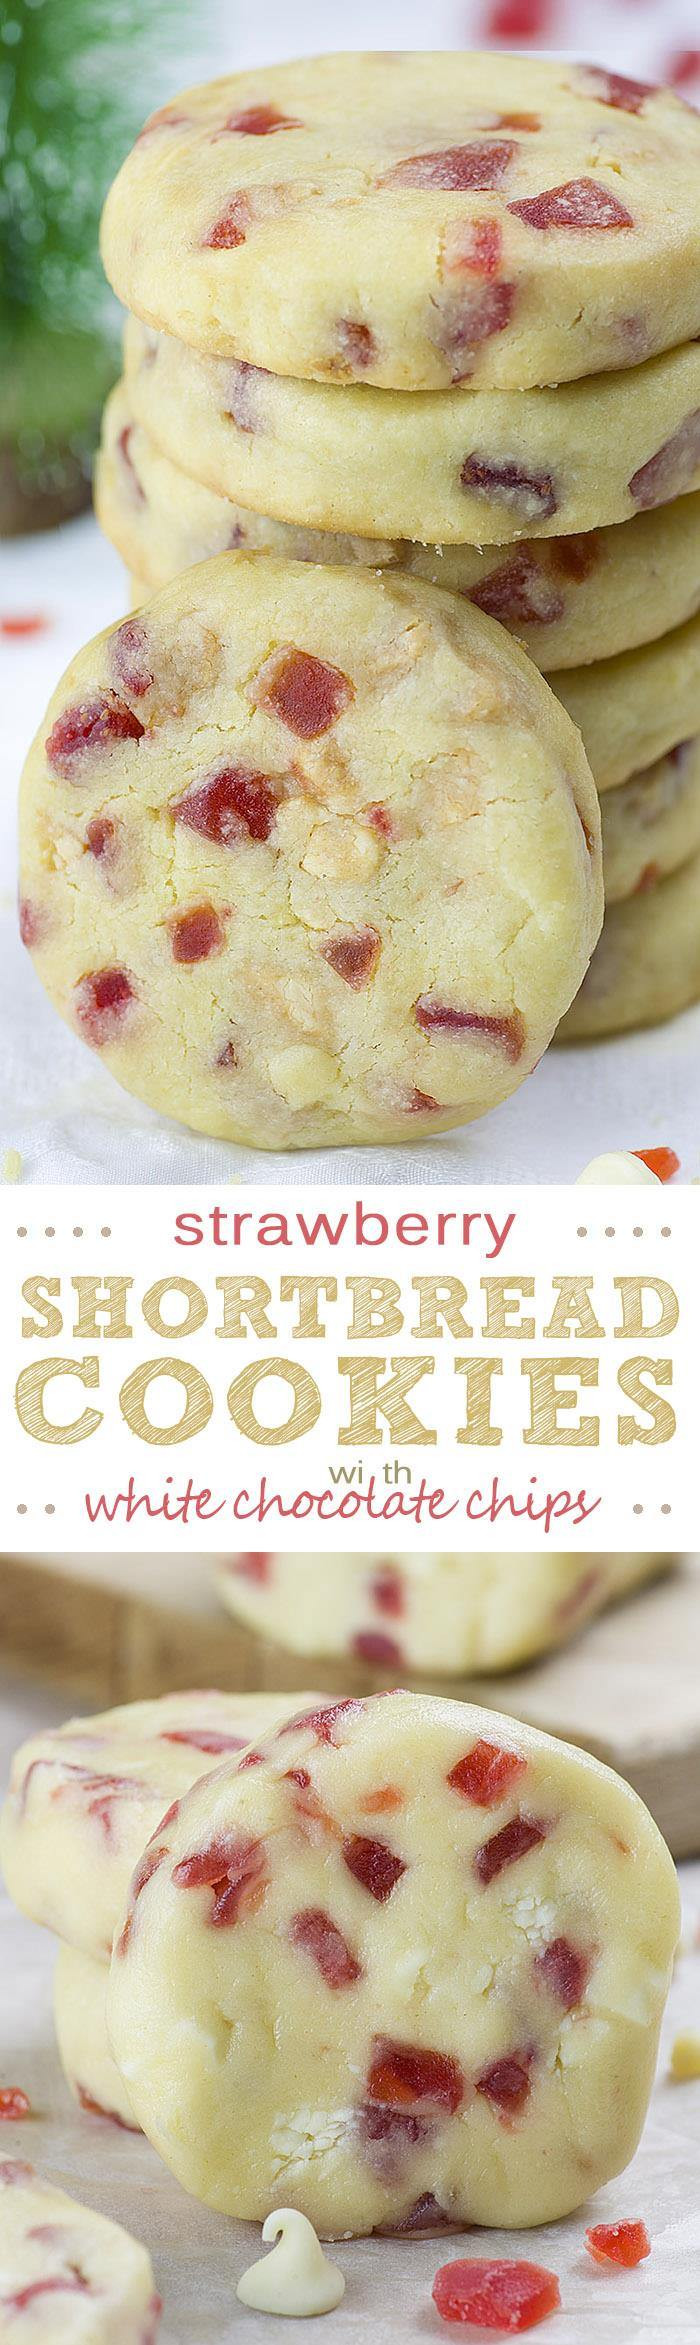 Best Shortbread Cookies  White Chocolate Strawberry Shortbread Cookies